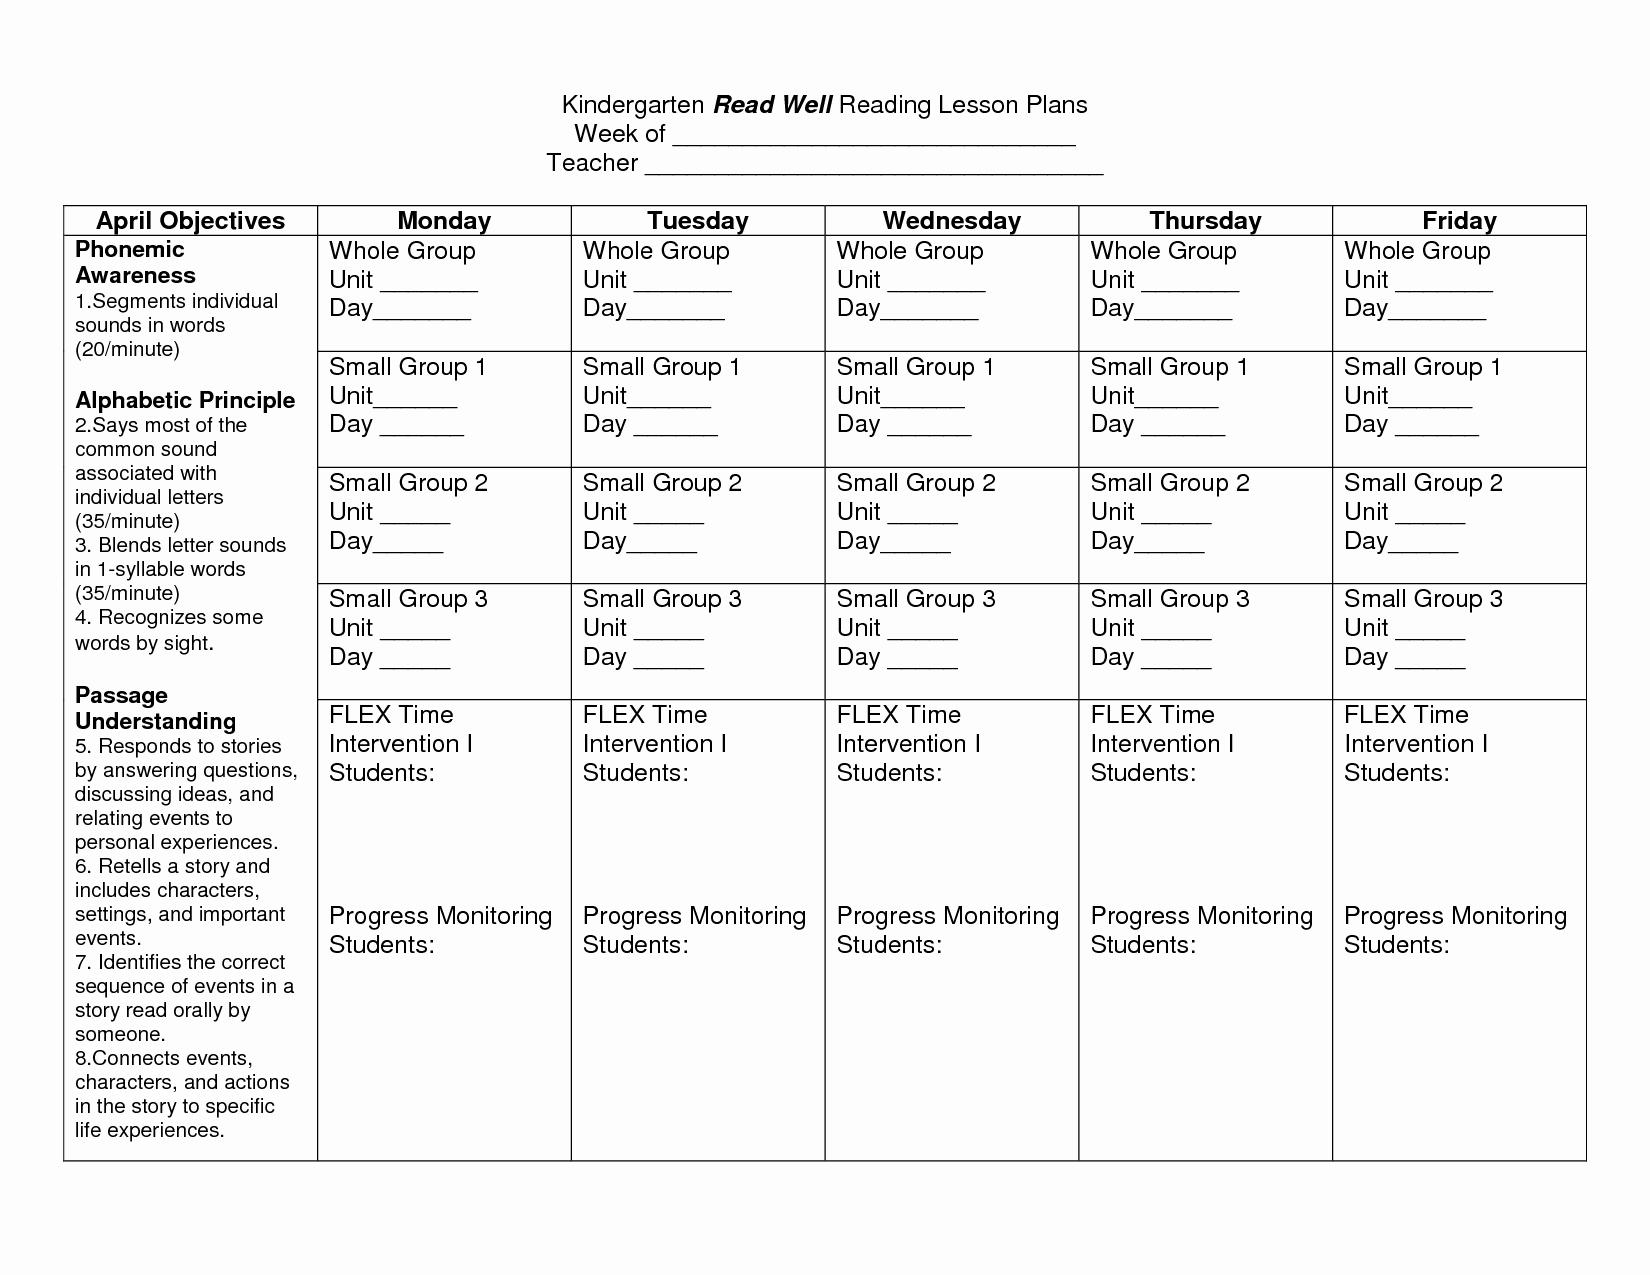 Kindergarten Lesson Plan Template Inspirational Kindergarten Lesson Plan Template